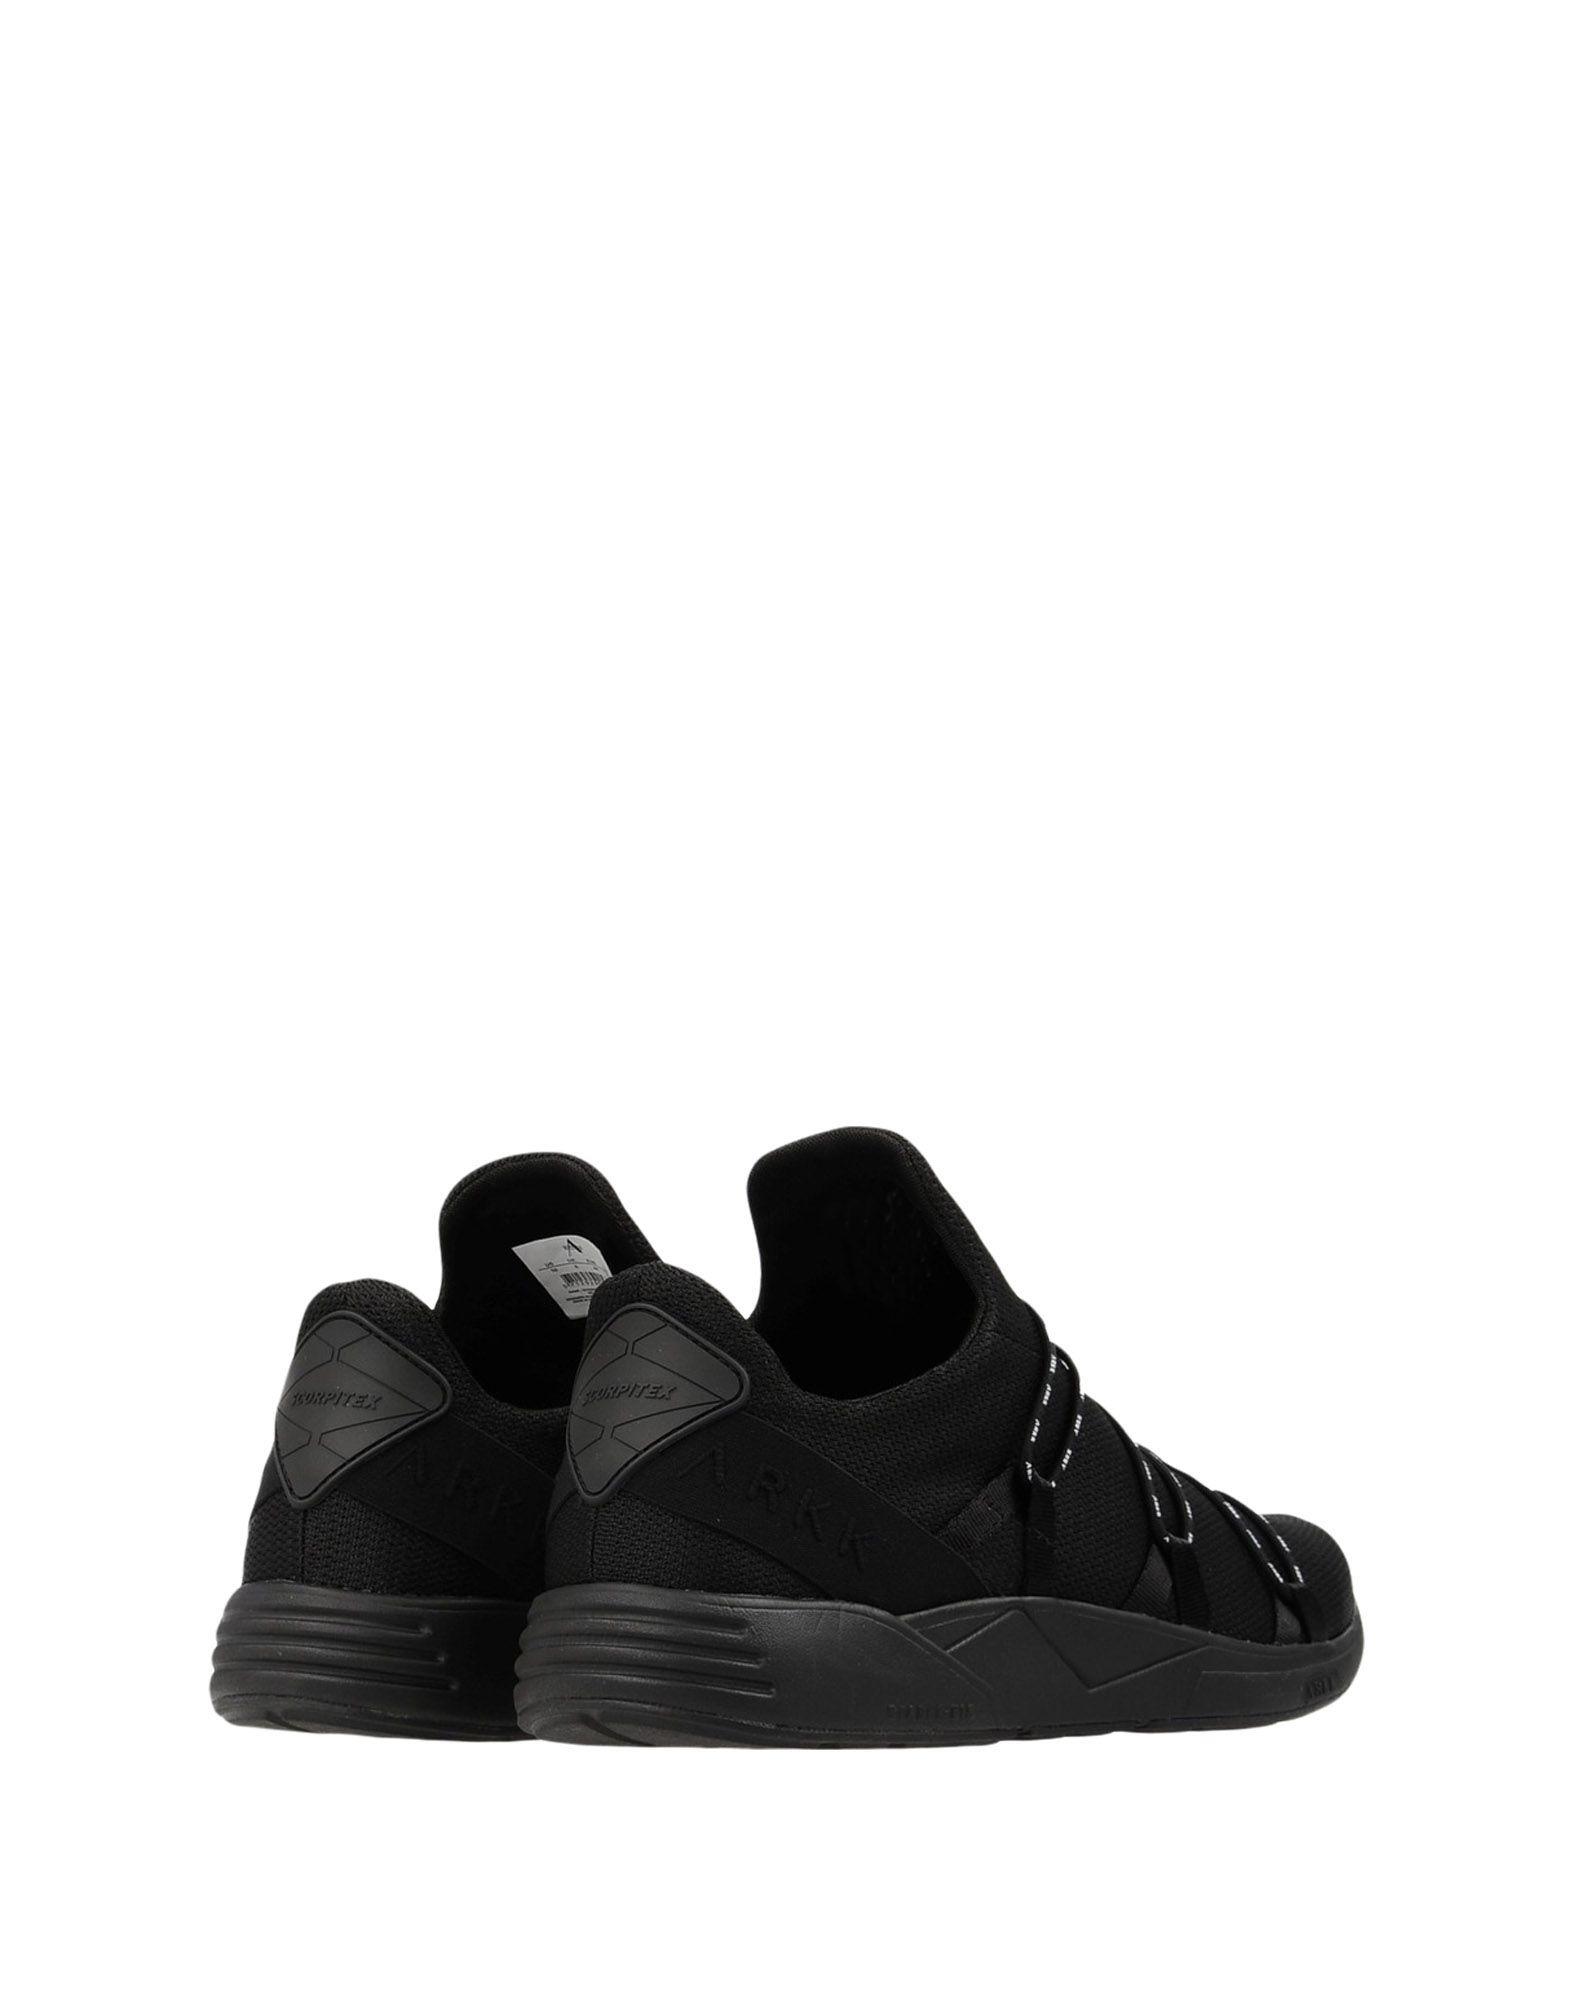 Sneakers Arkk Copenhagen Scorpitex S-E15 - Homme - Sneakers Arkk Copenhagen sur